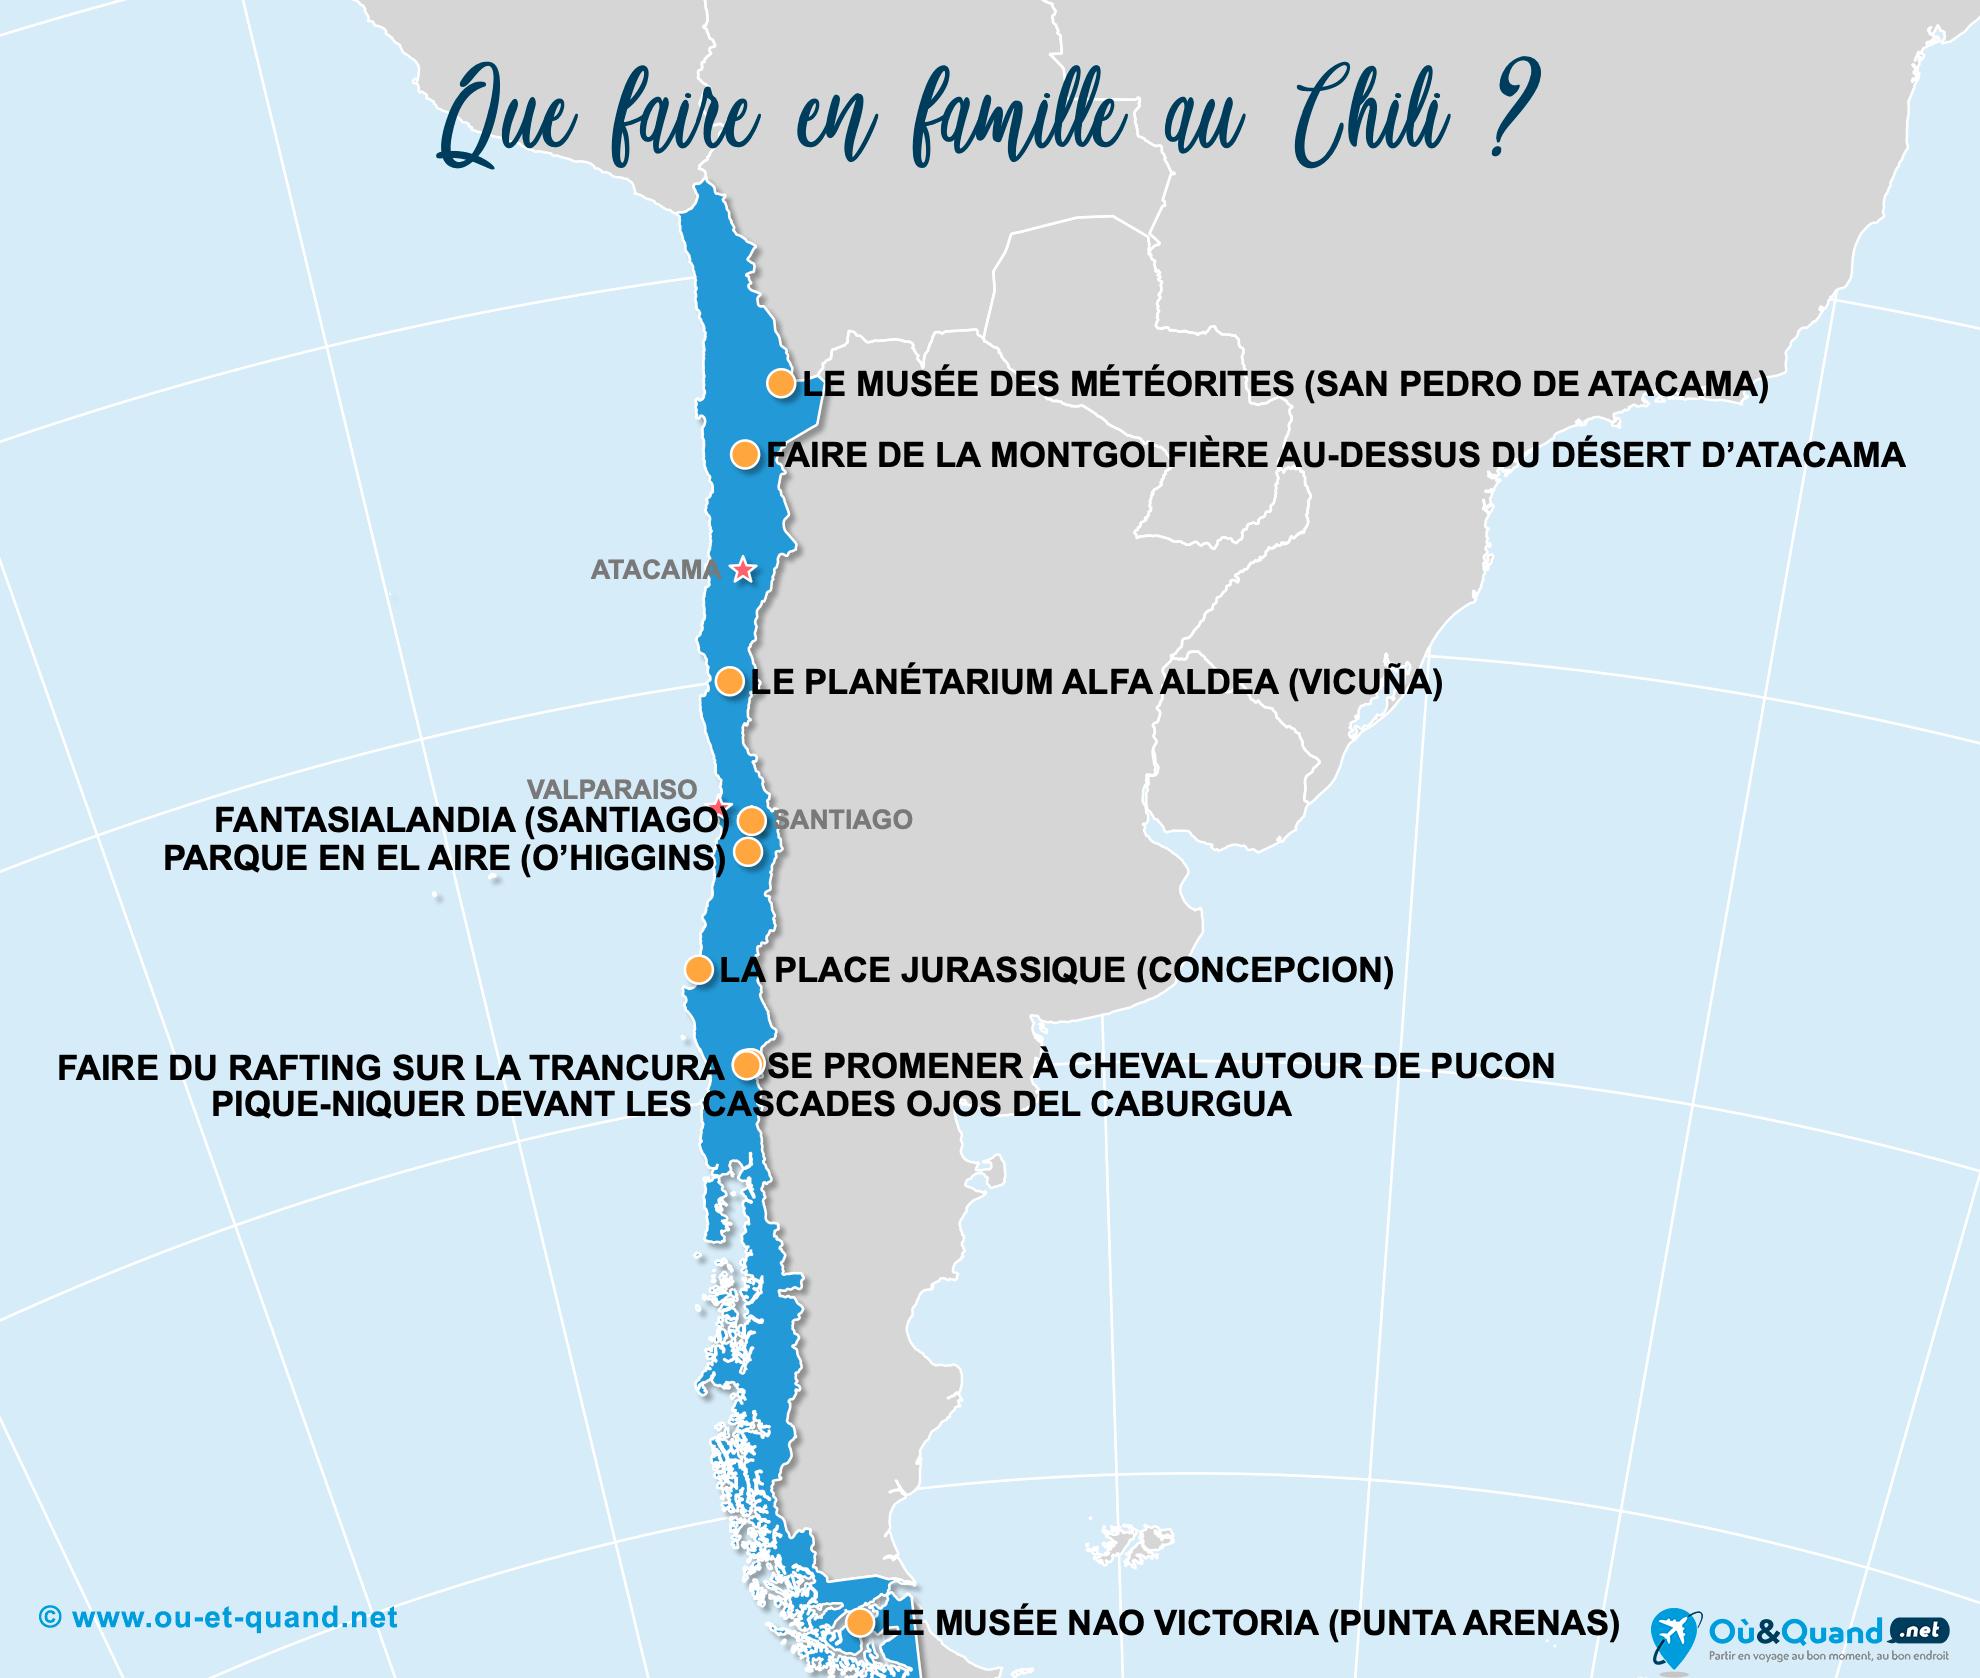 Carte Chili : Le Chili en famille